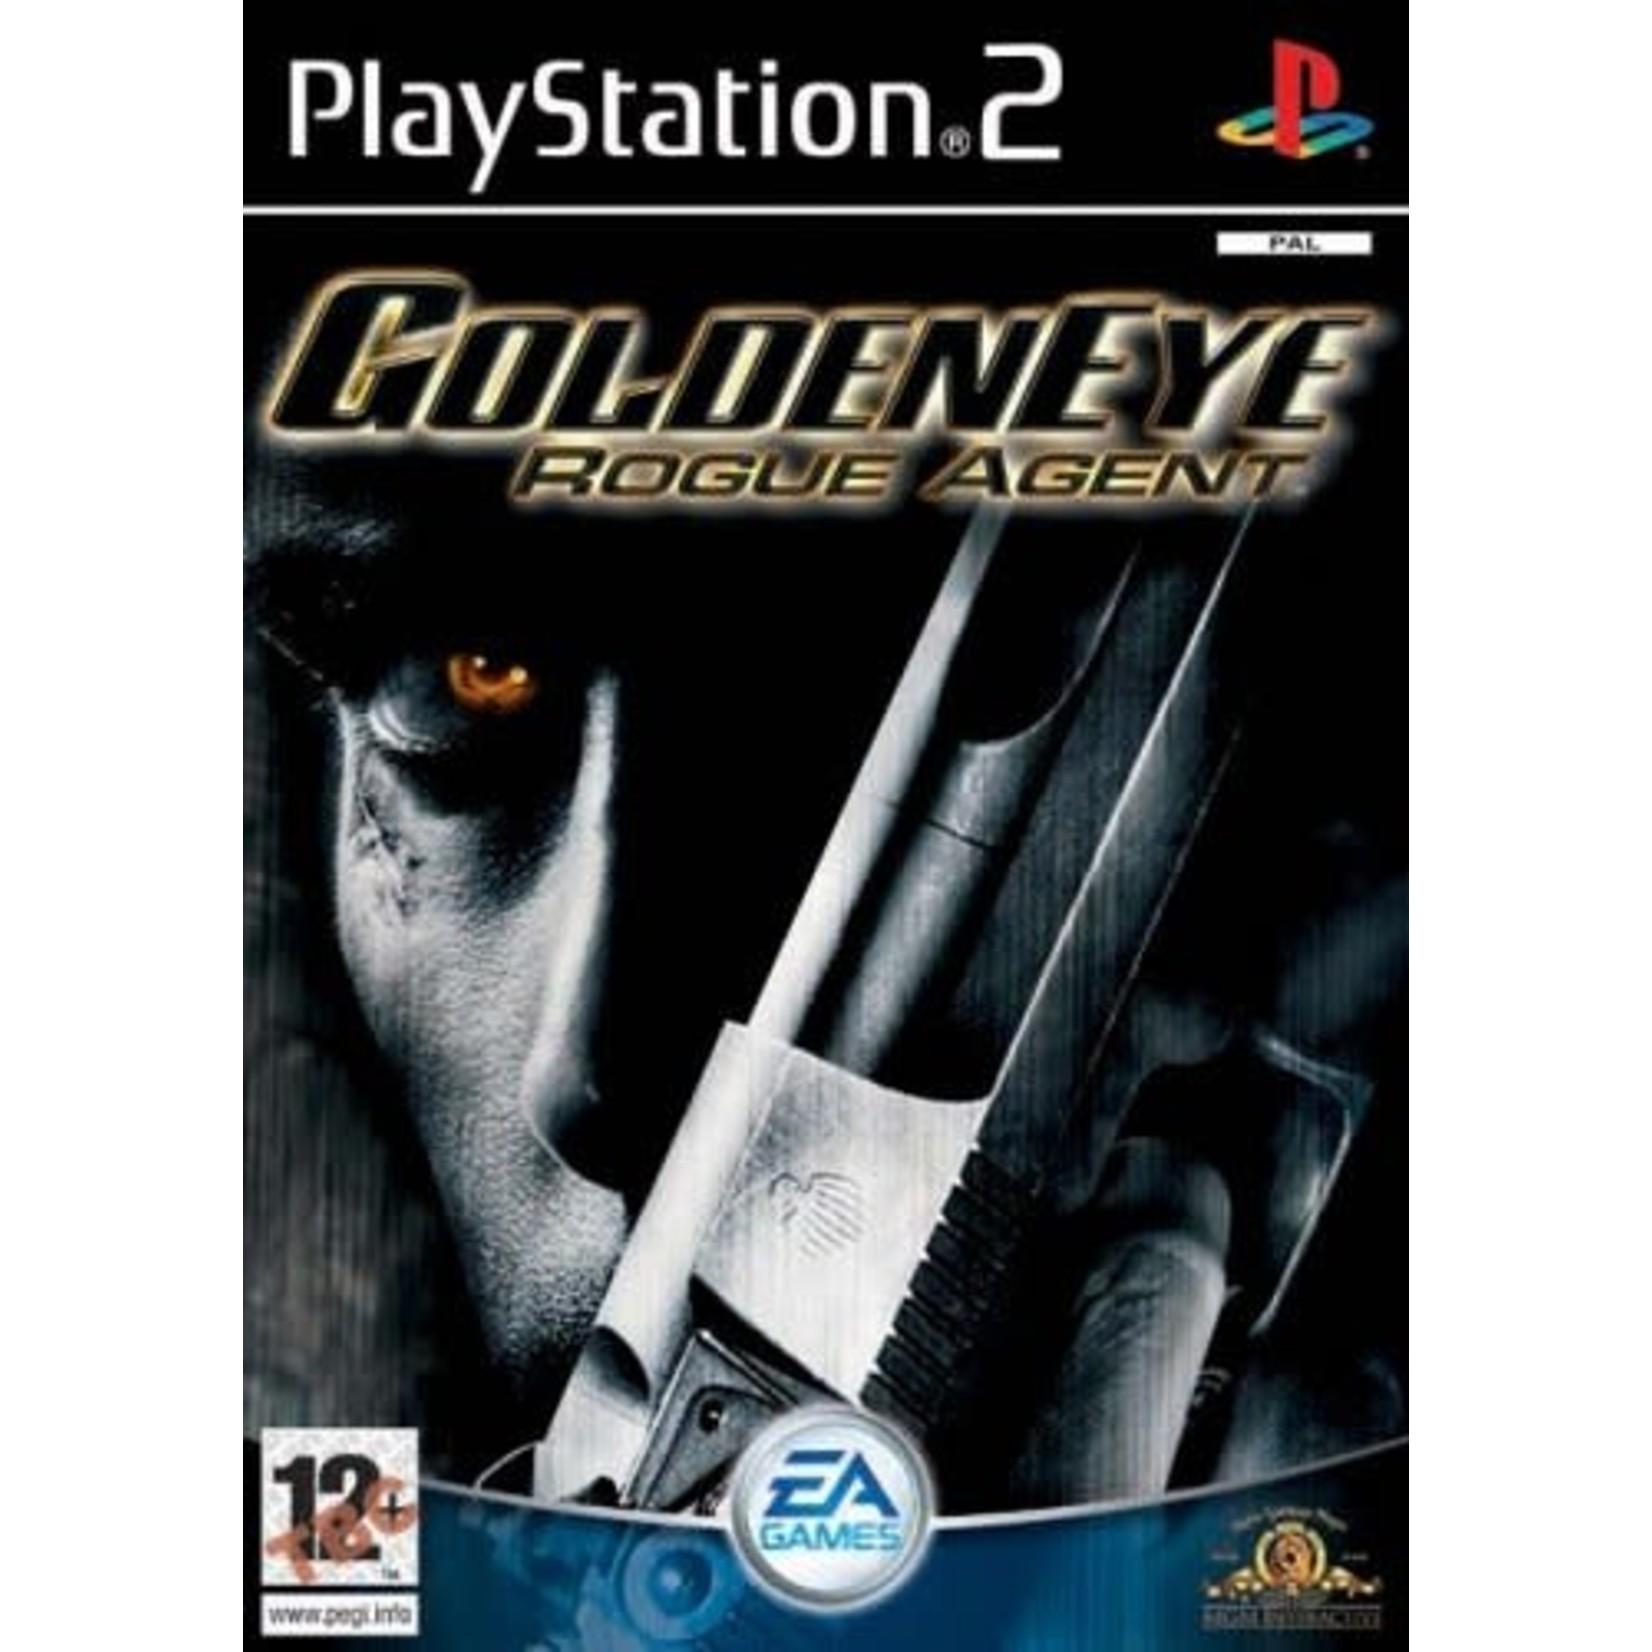 PS2U-007 GoldenEye Rogue Agent